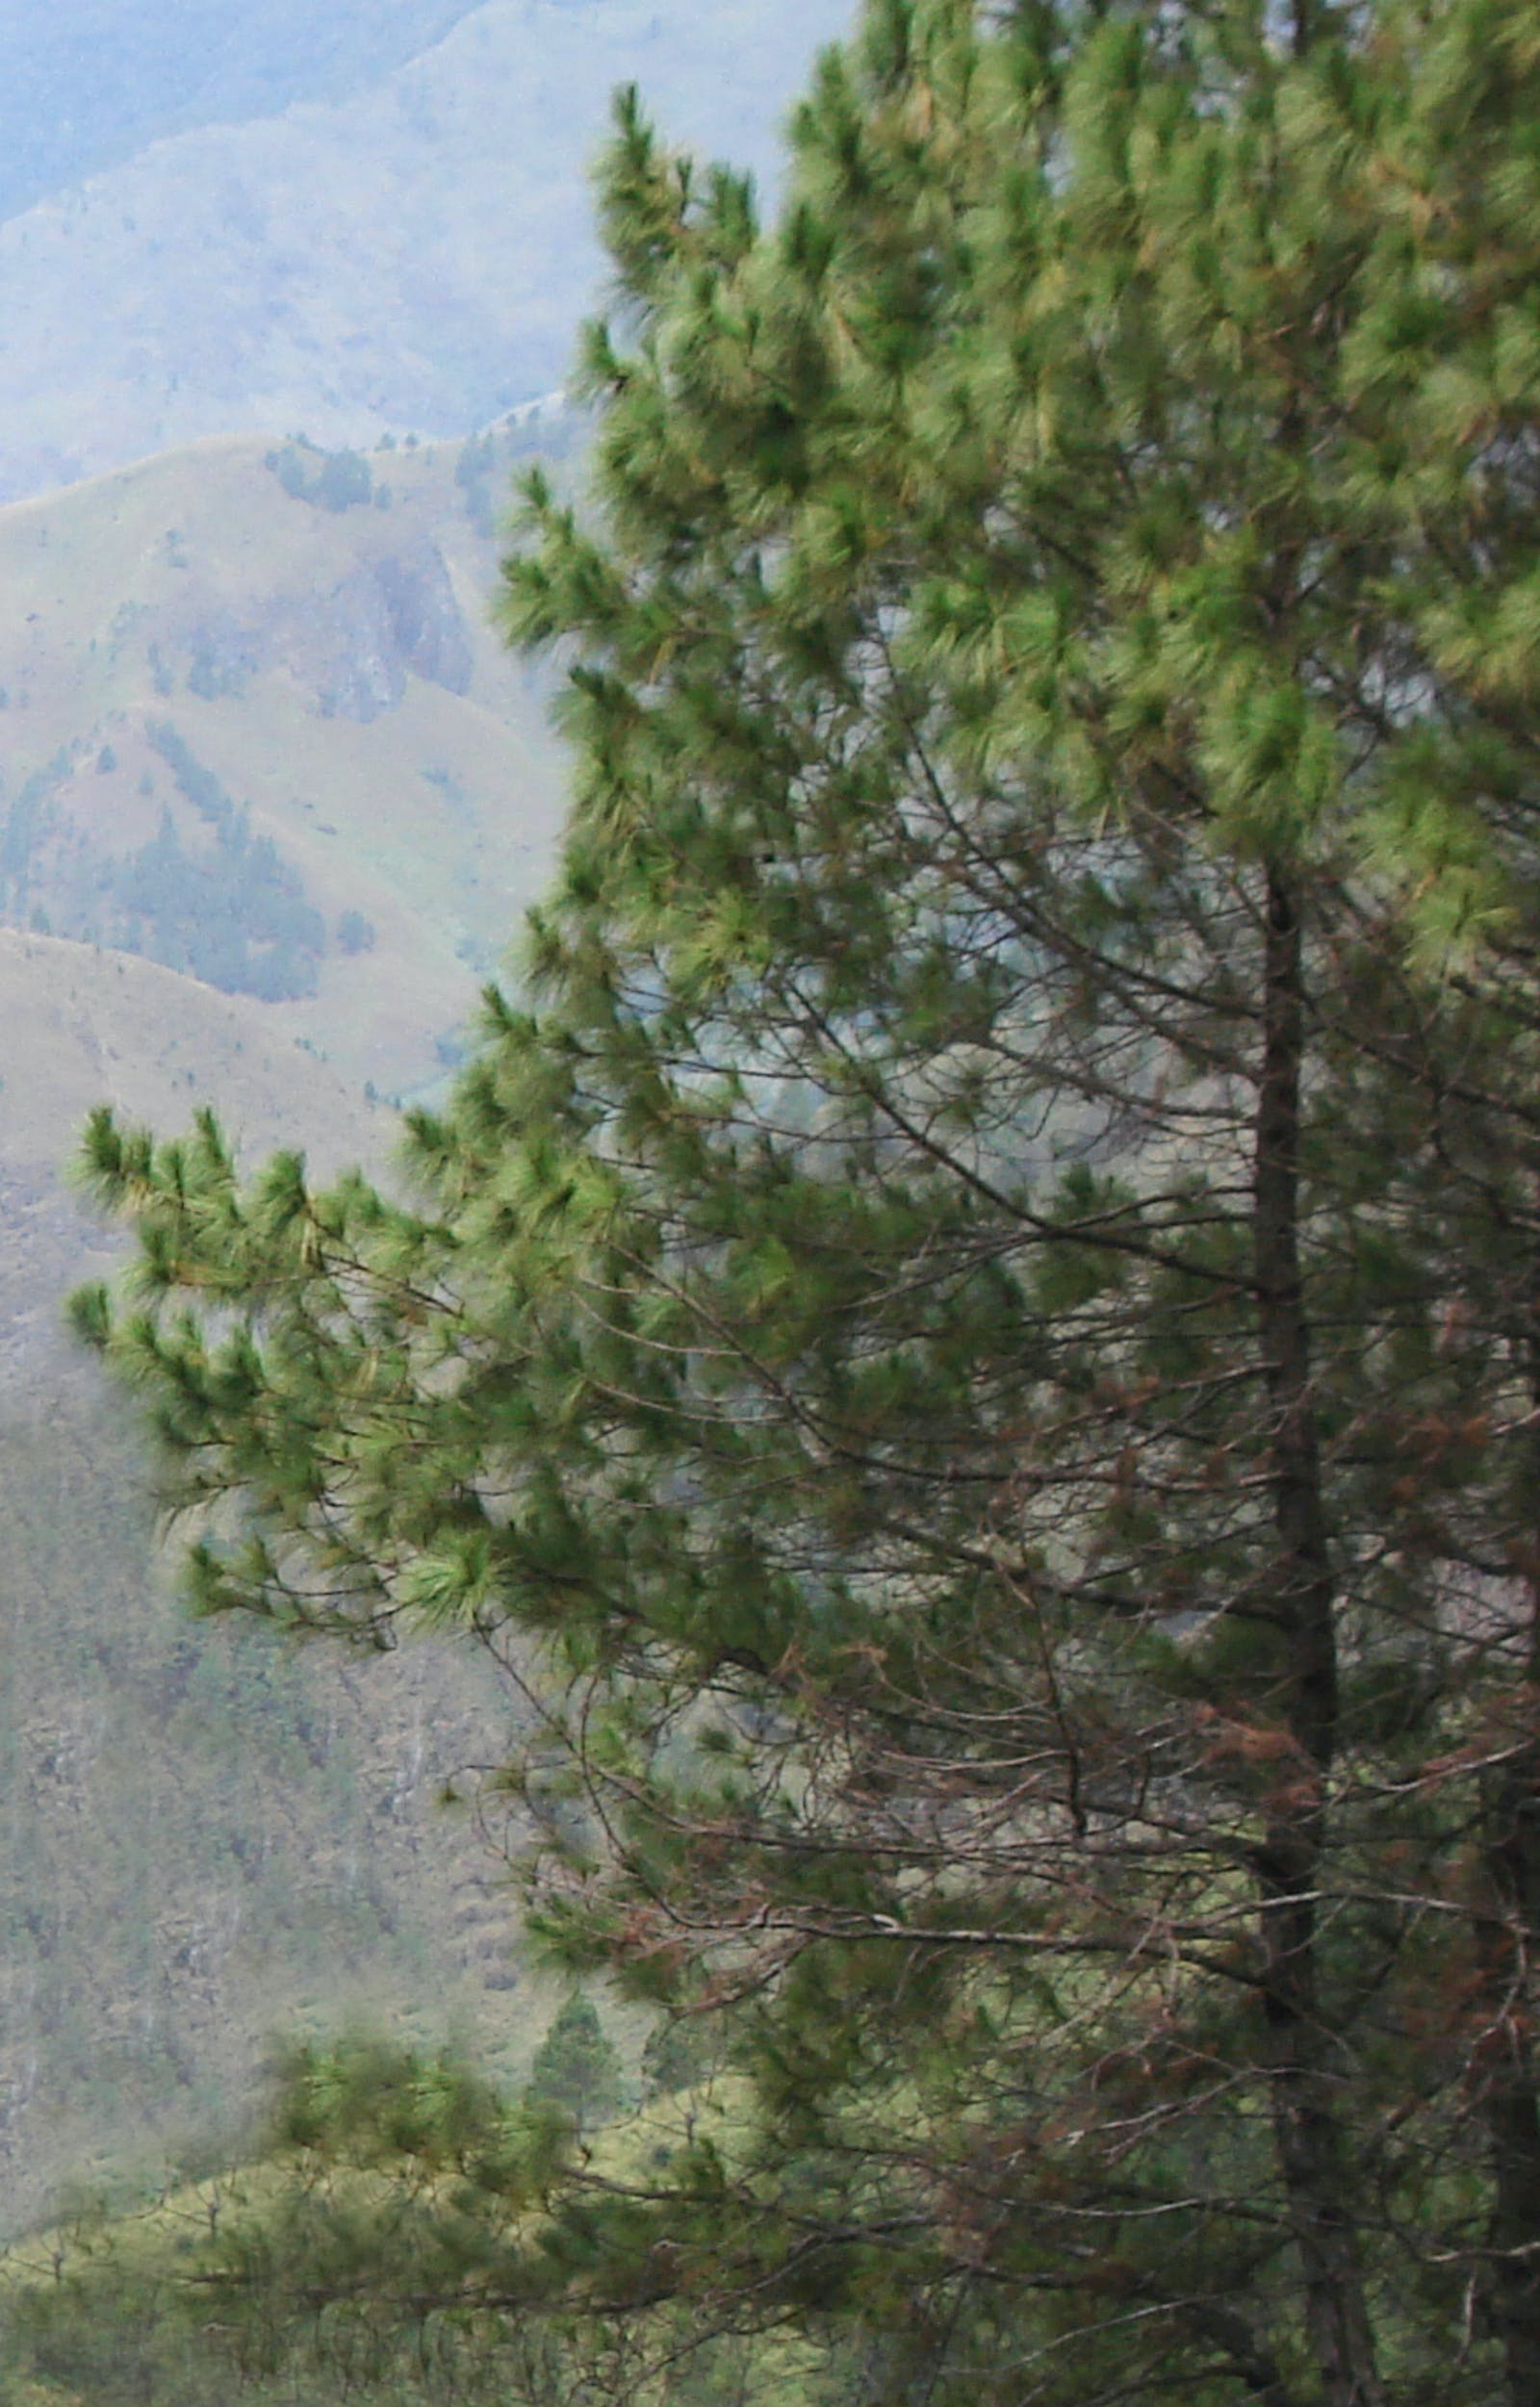 Sumatran Tropical Pine Forests